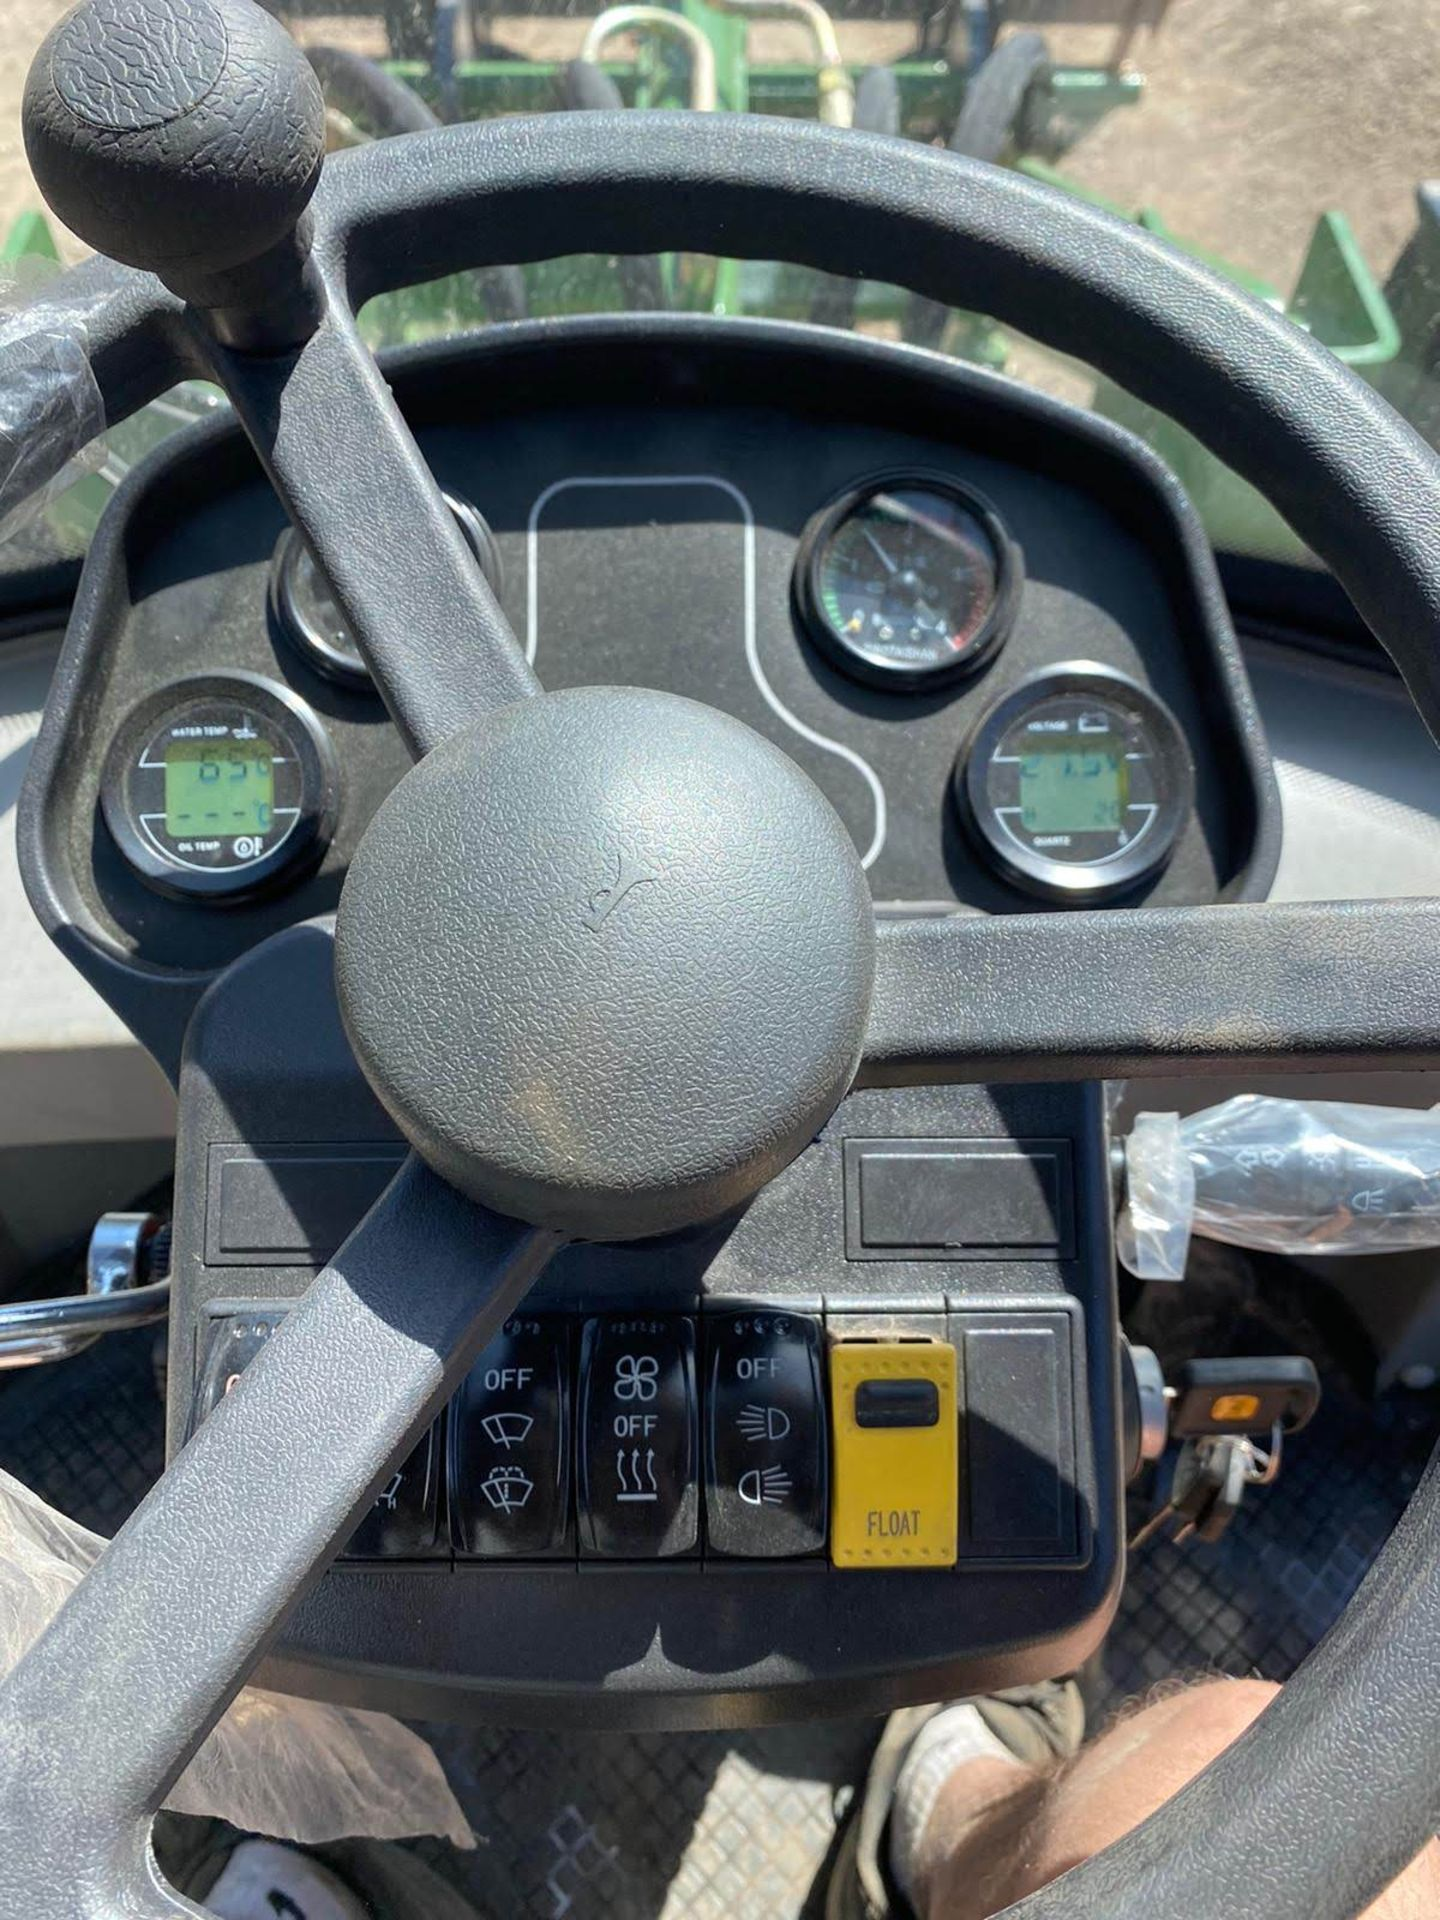 BRAND NEW / UNUSED 2020 LOADING SHOVEL, MODEL ZL08F, 4 WHEEL DRIVE, C/W BUCKETS & FORKS *PLUS VAT* - Image 8 of 9